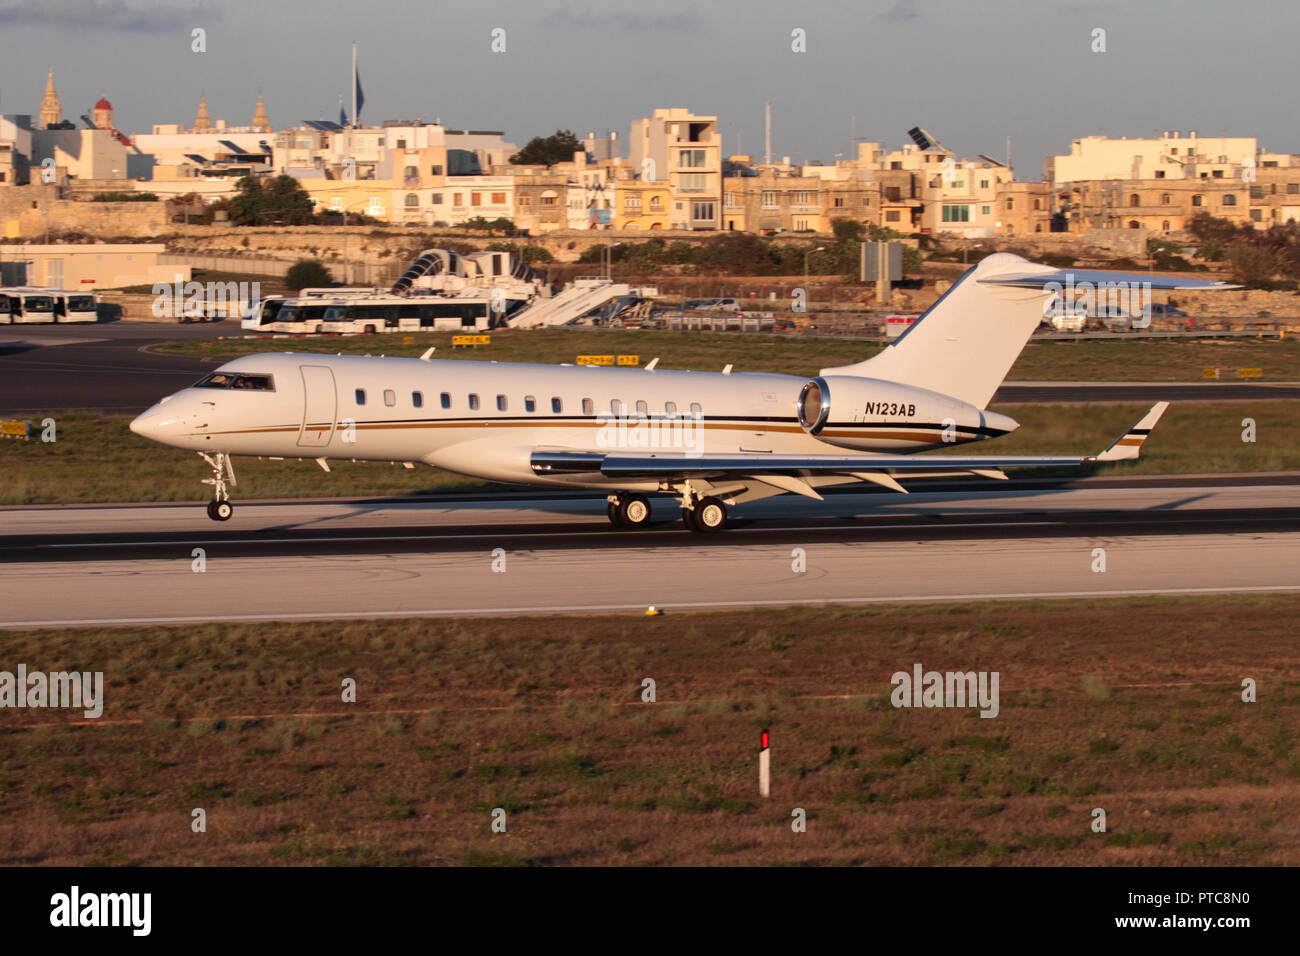 Bombardier Global Express large business jet aeroplane keeping its nose up while landing in Malta at sunset - Stock Image